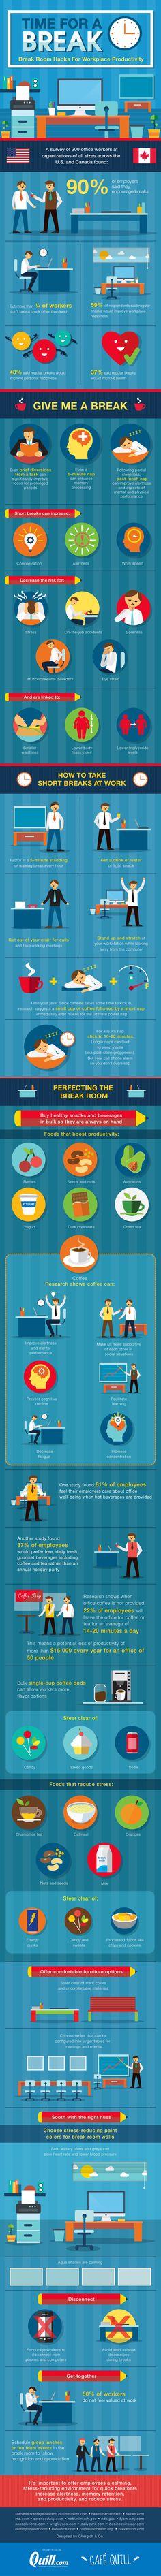 How to Create Ultimate Break Room at Work